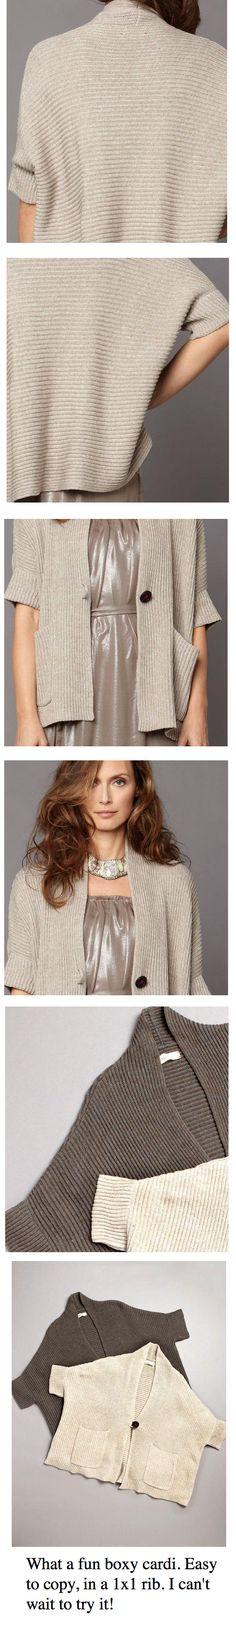 boxy knit cardigan from LABEL+thread from vau.lt